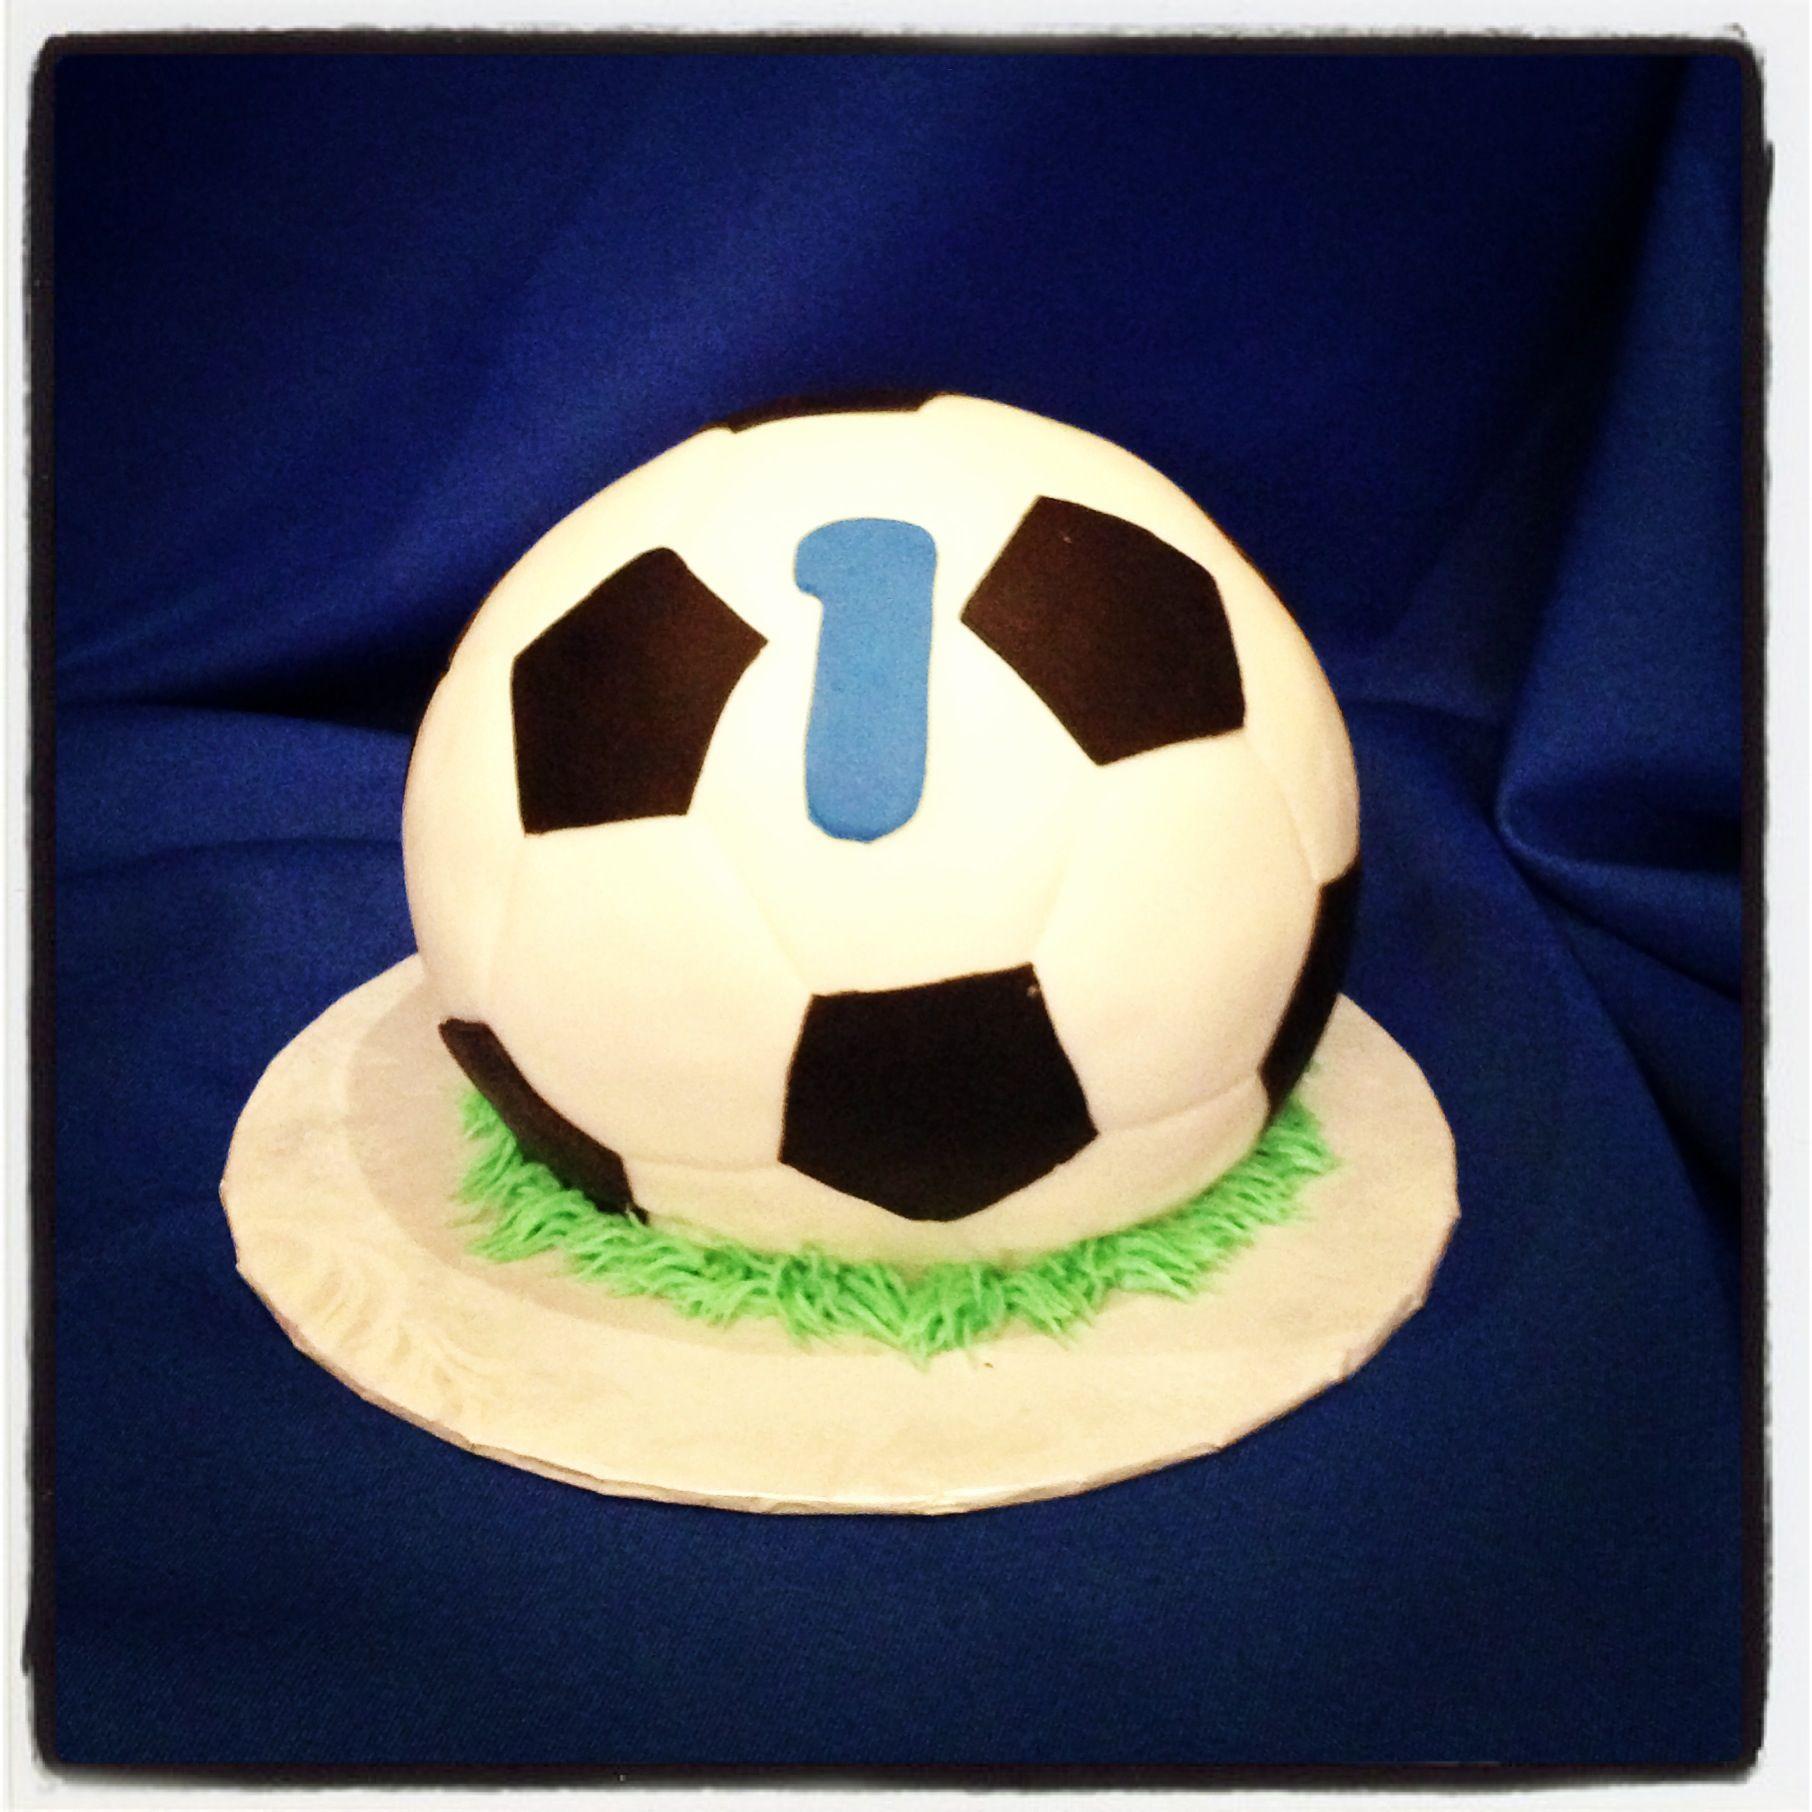 Craftsy Com Express Your Creativity Creative Birthday Cakes Soccer Cake Sports Themed Cakes